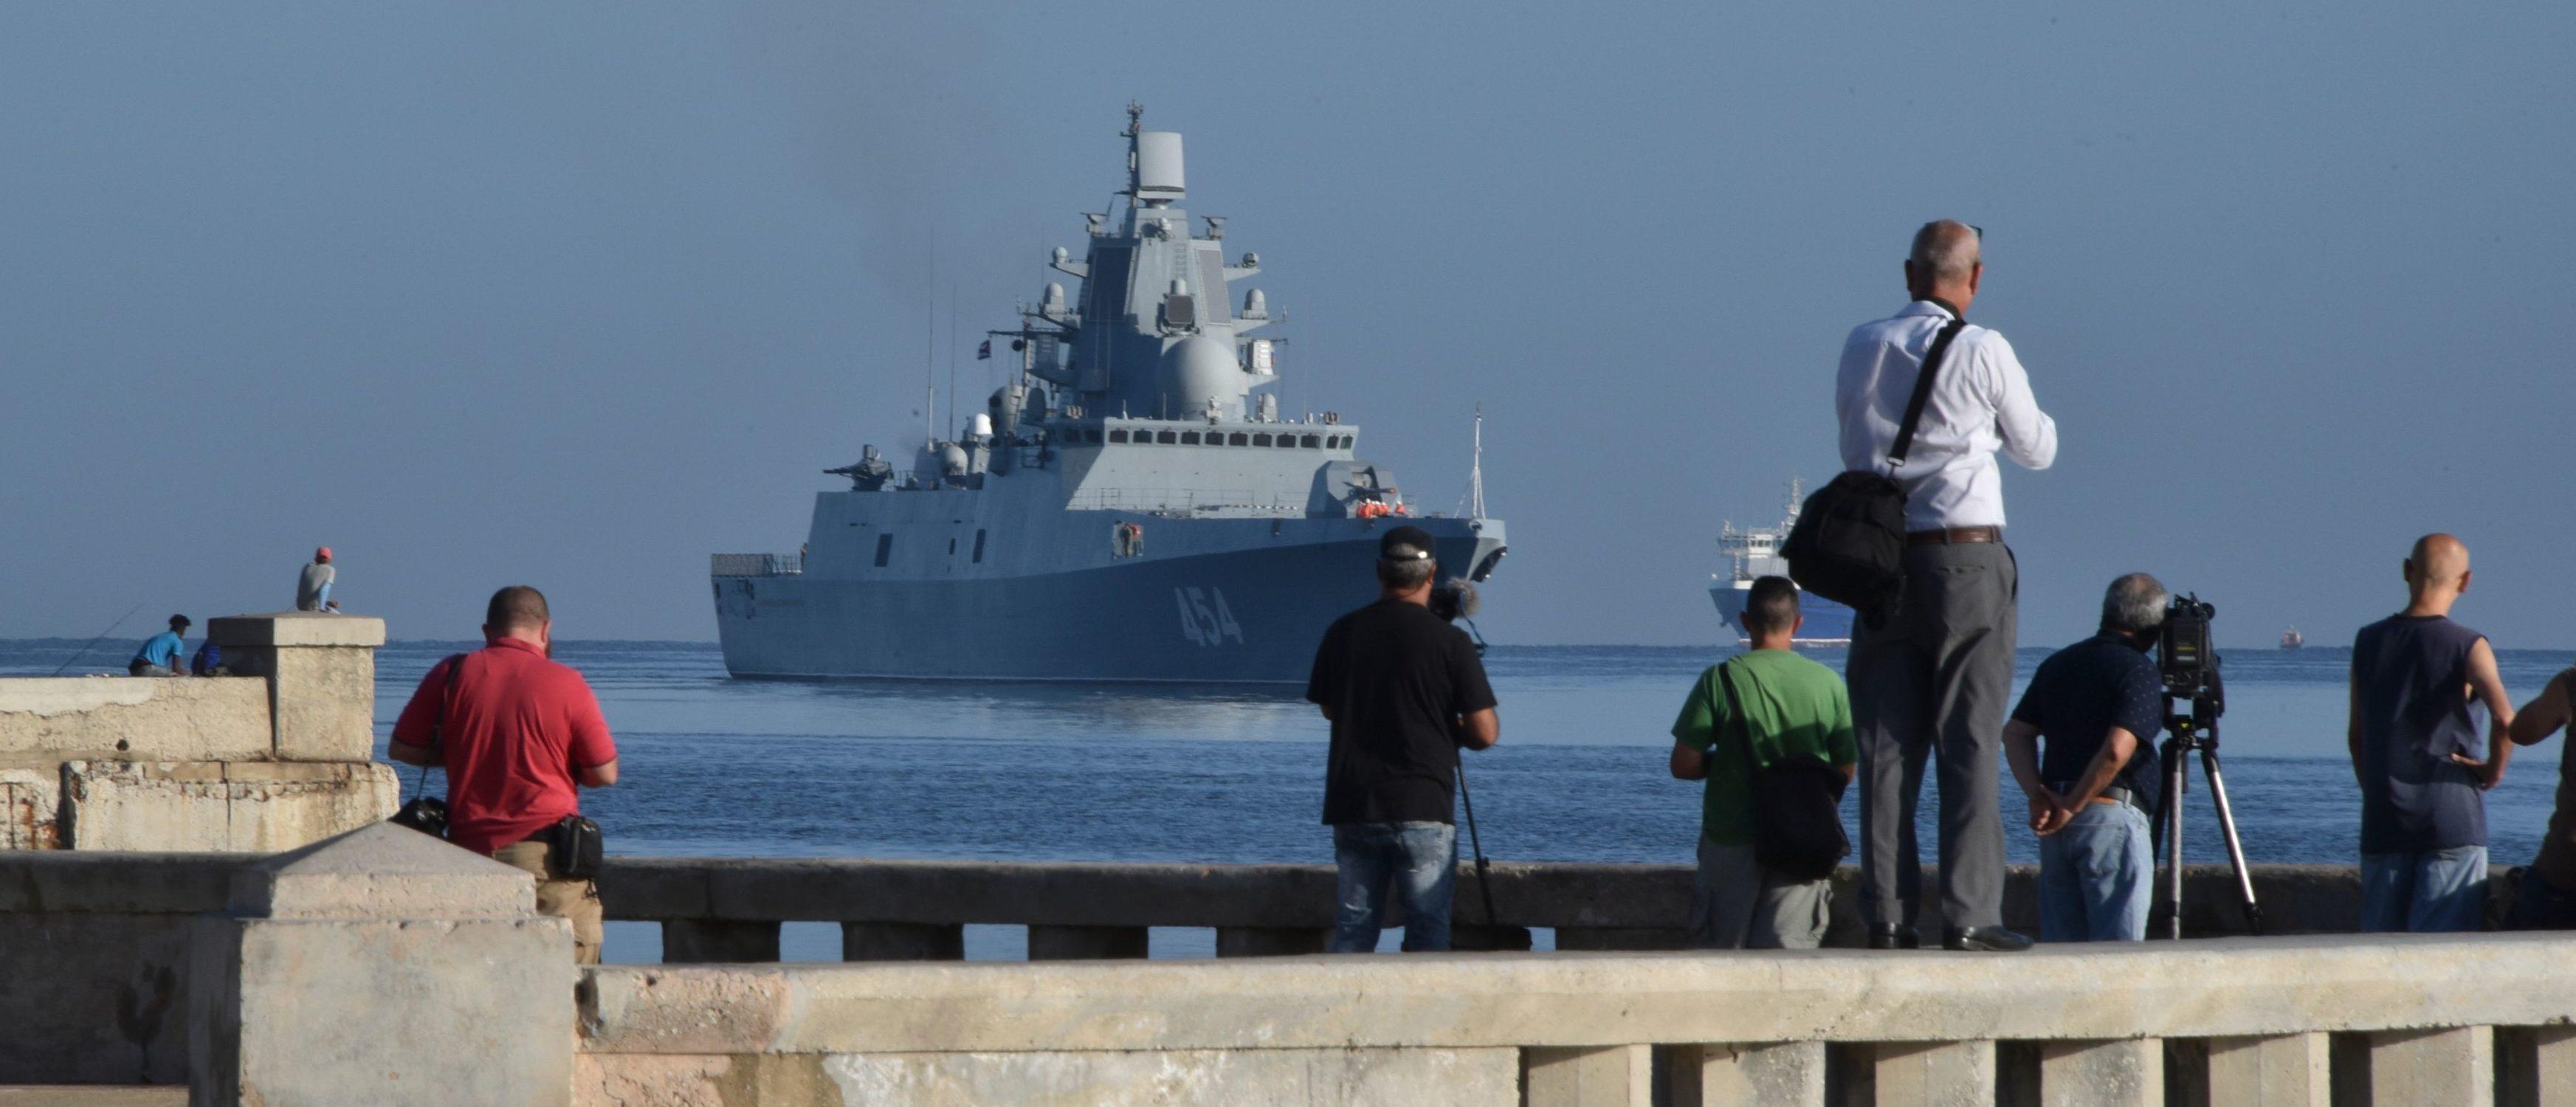 Russian Warship Gets 21-Gun Salute Upon Arrival At Havana Harbor